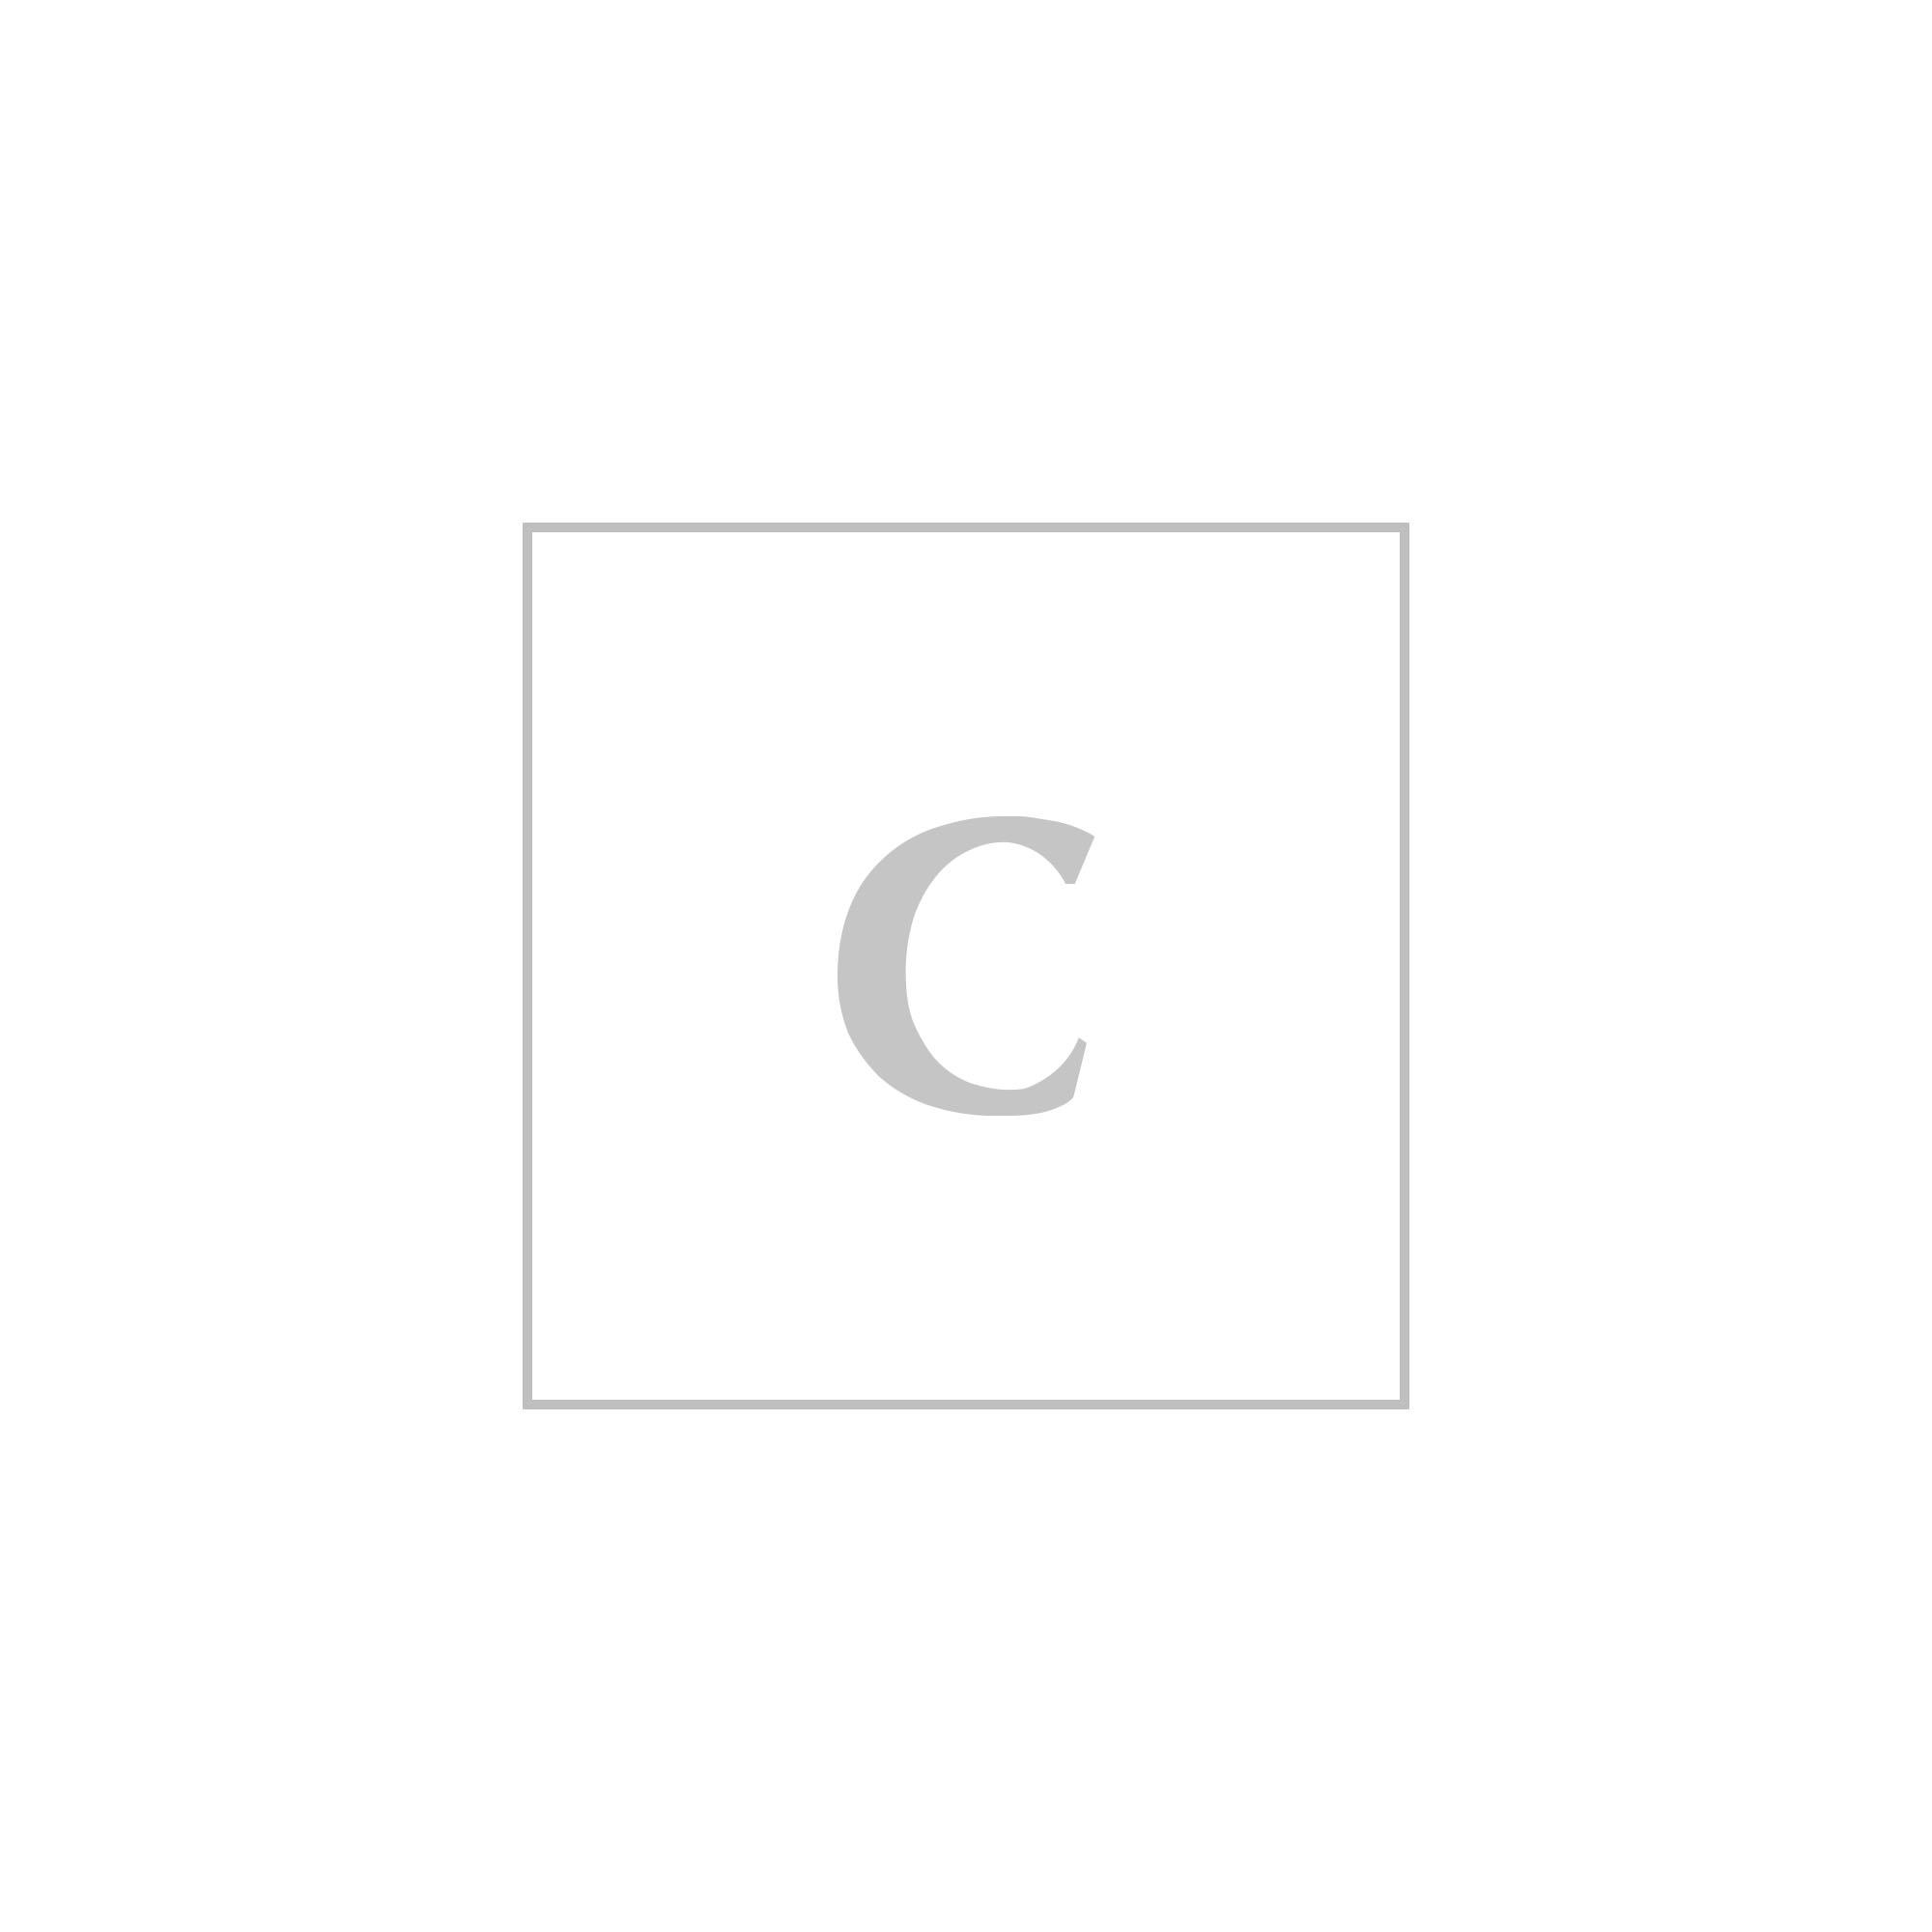 Prada polo jersey piquet prada